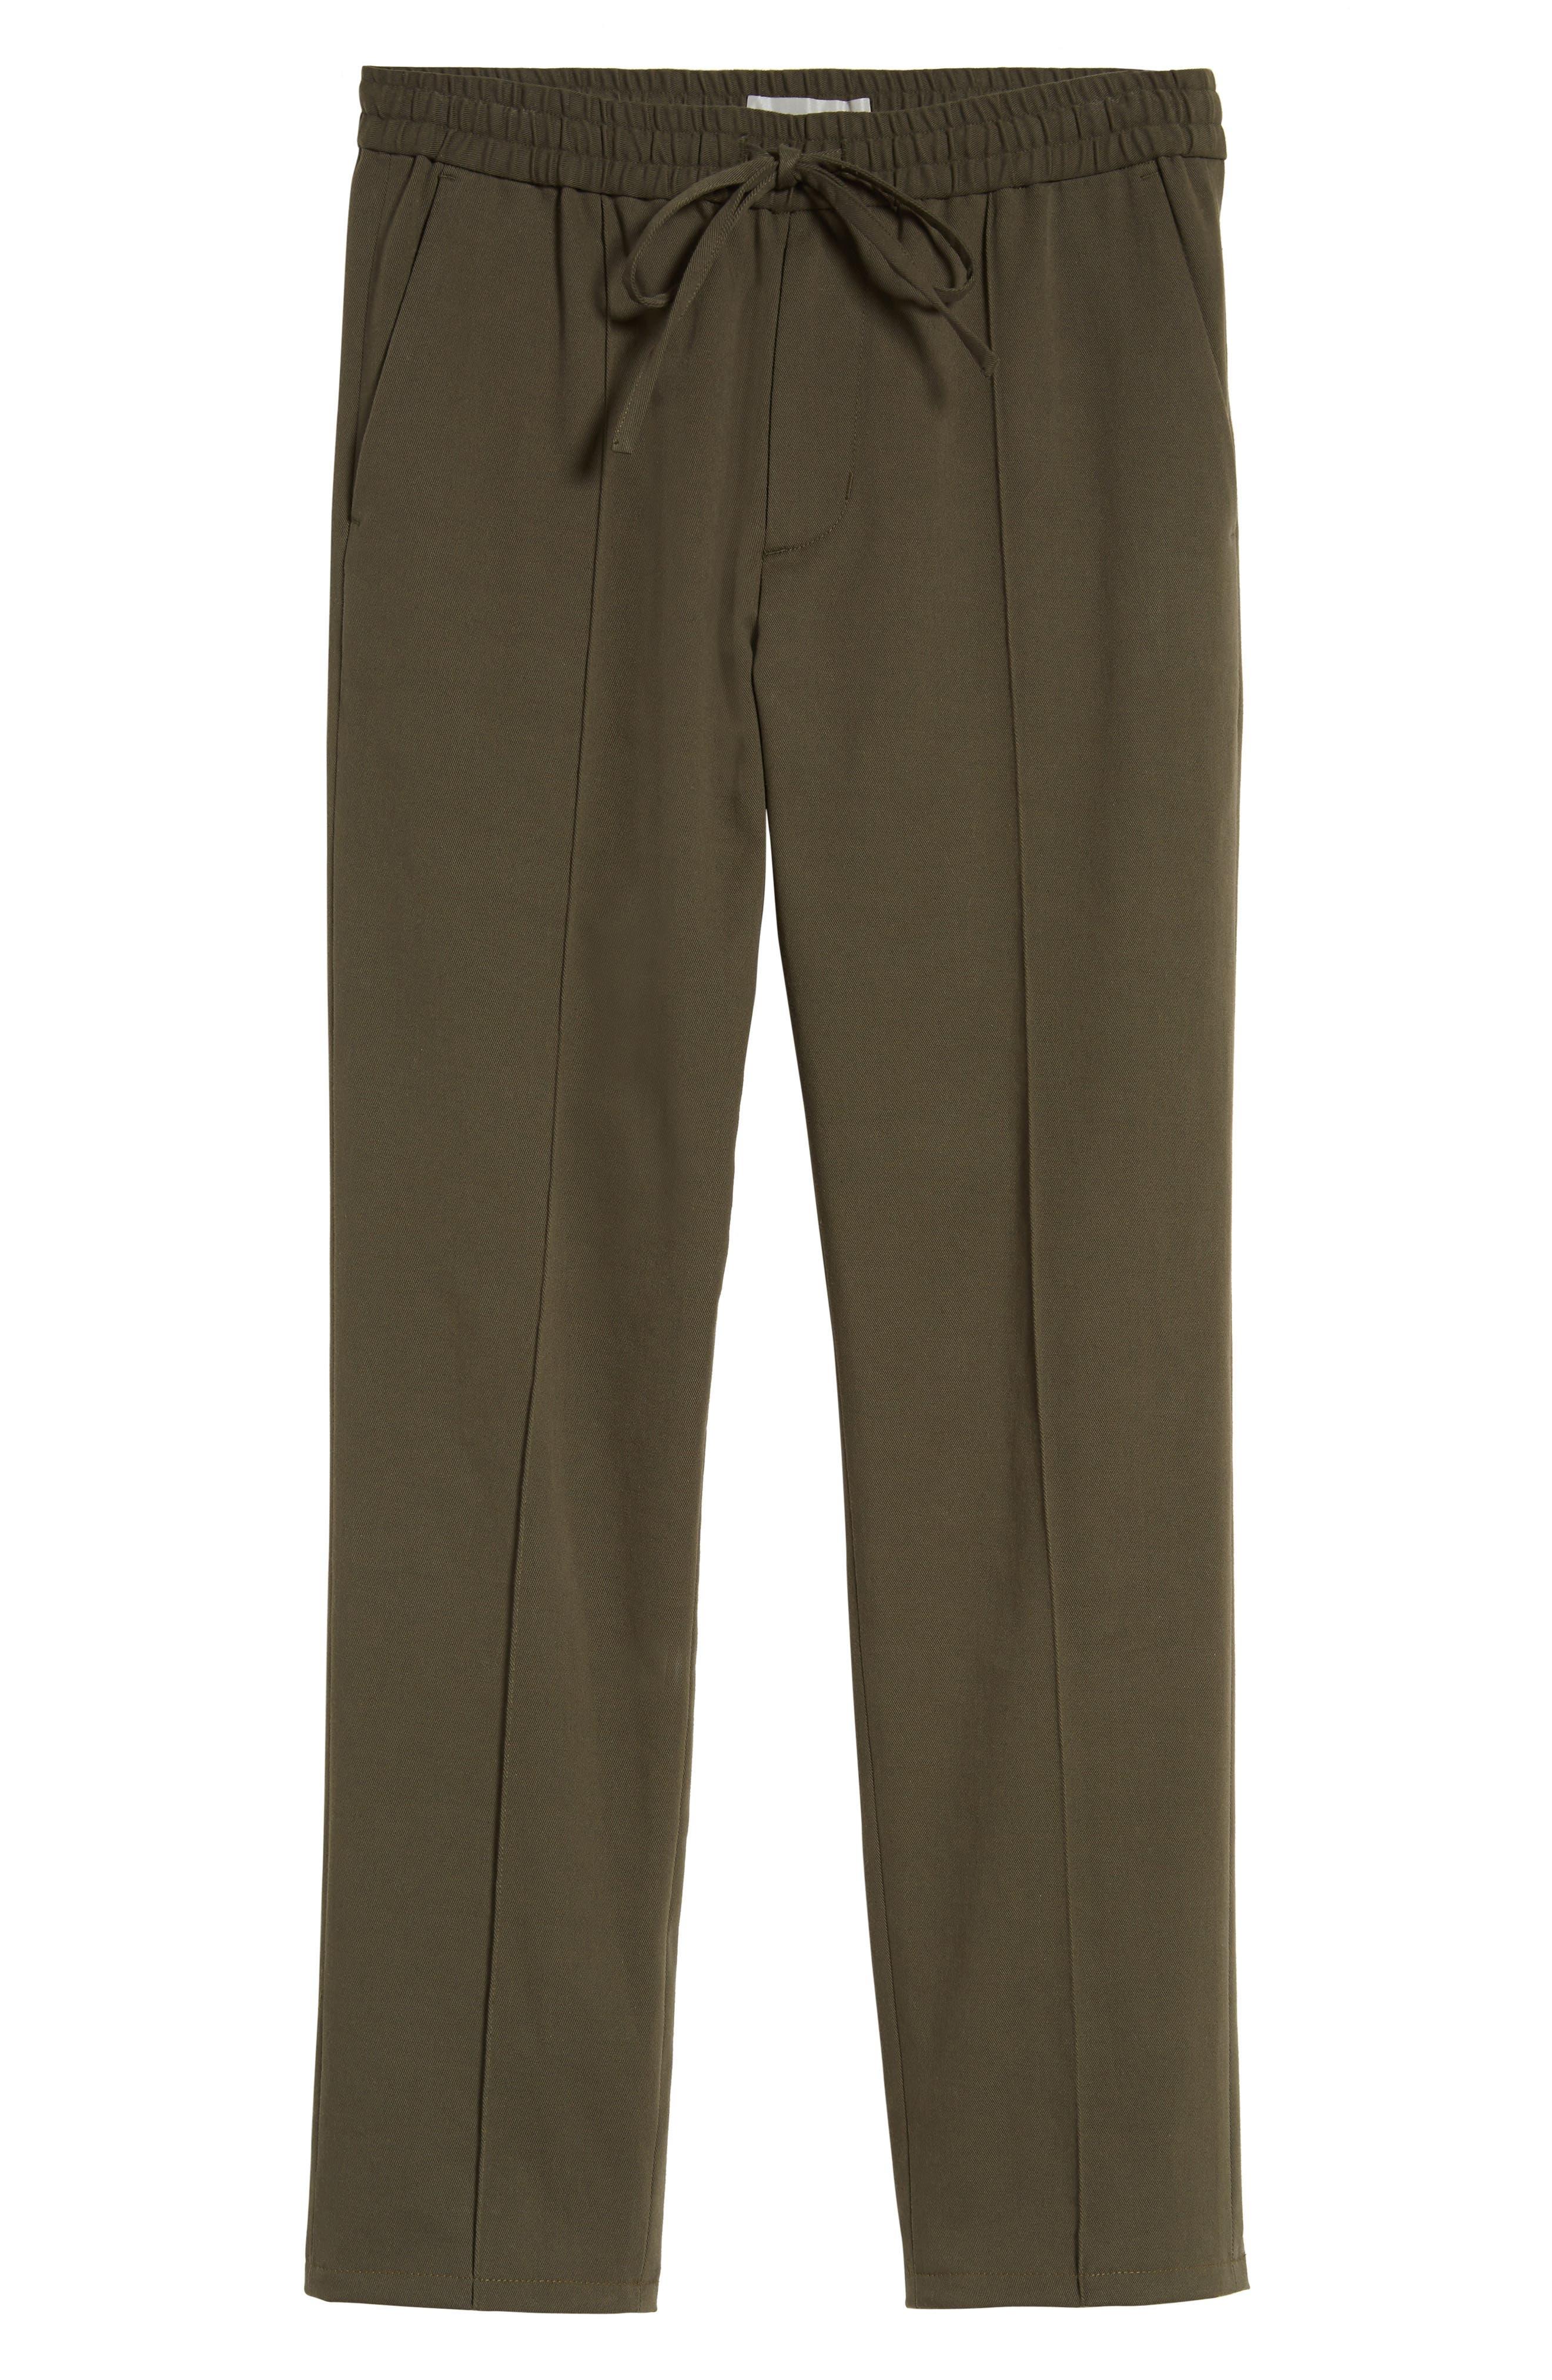 Regular Fit Track Pants,                             Alternate thumbnail 6, color,                             Fatigue